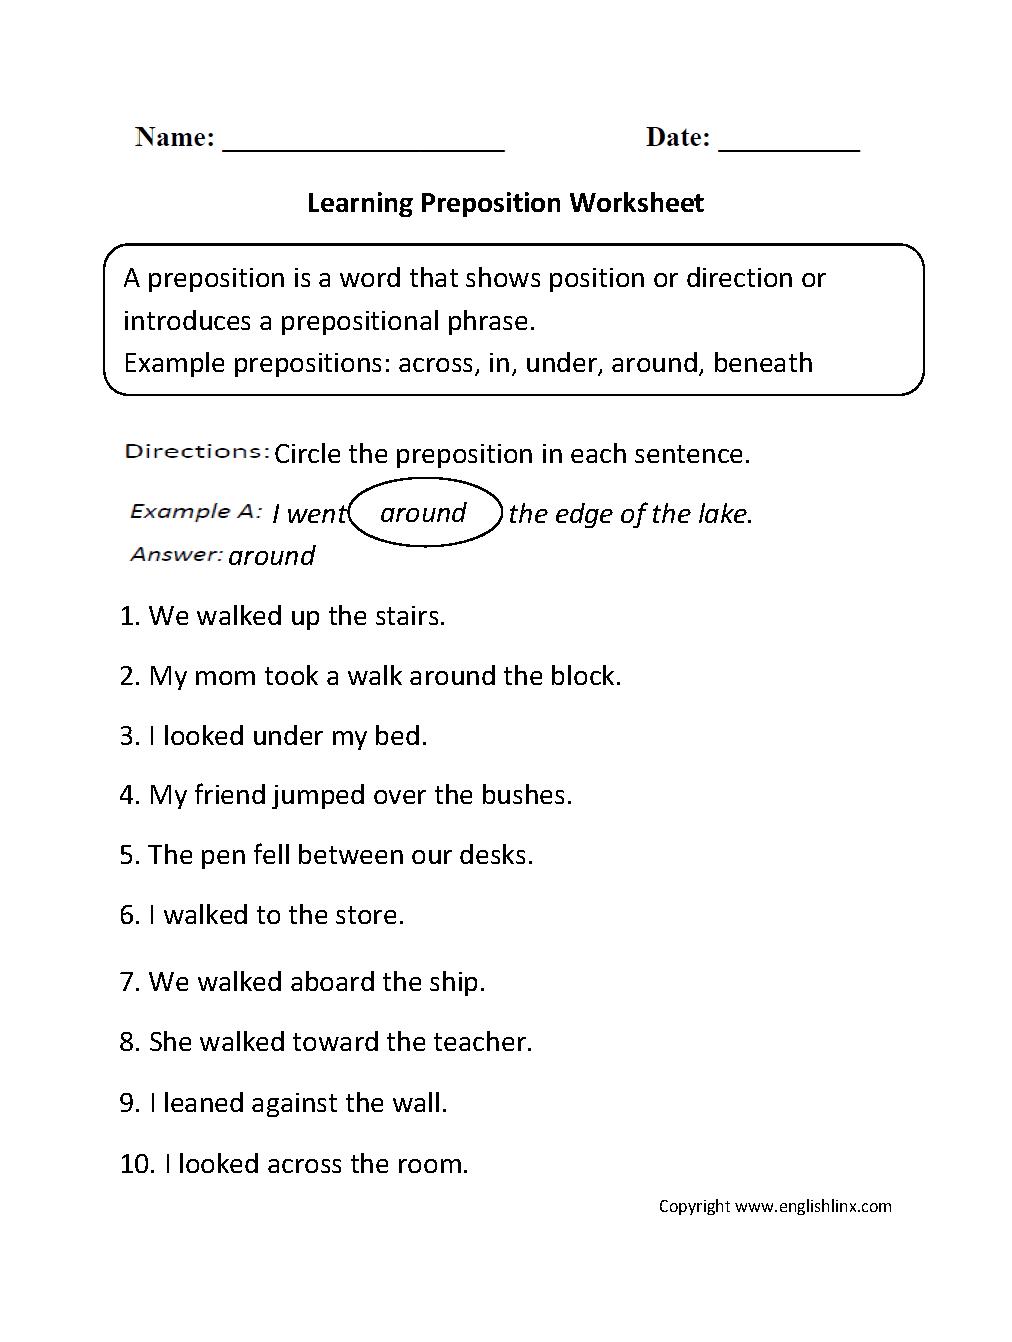 147 Free Esl Prepositions Worksheets For Upper Intermediate (b2